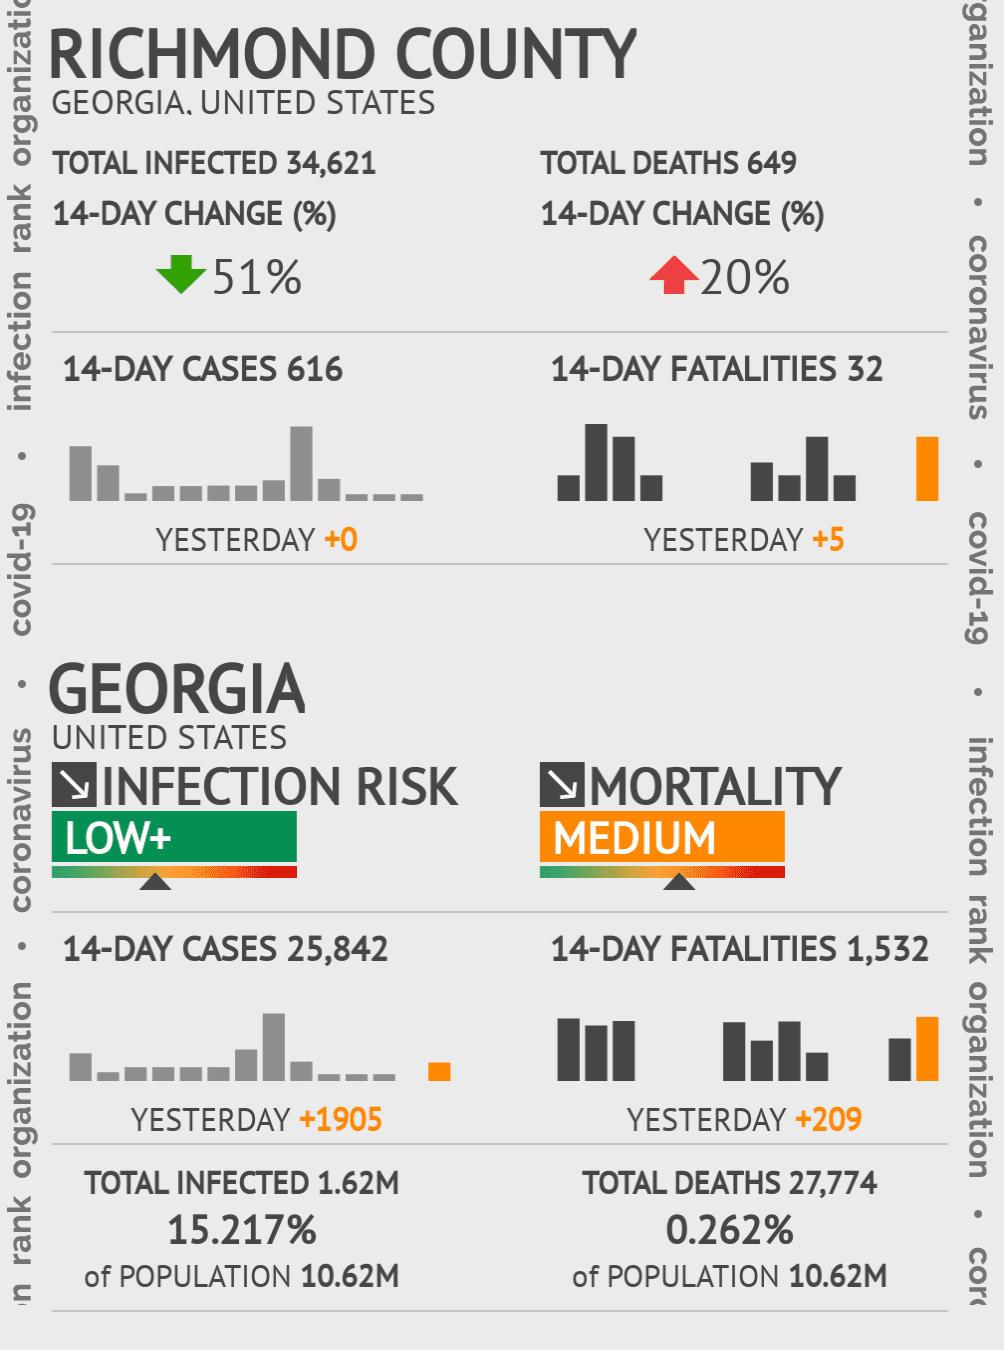 Richmond County Coronavirus Covid-19 Risk of Infection on November 22, 2020